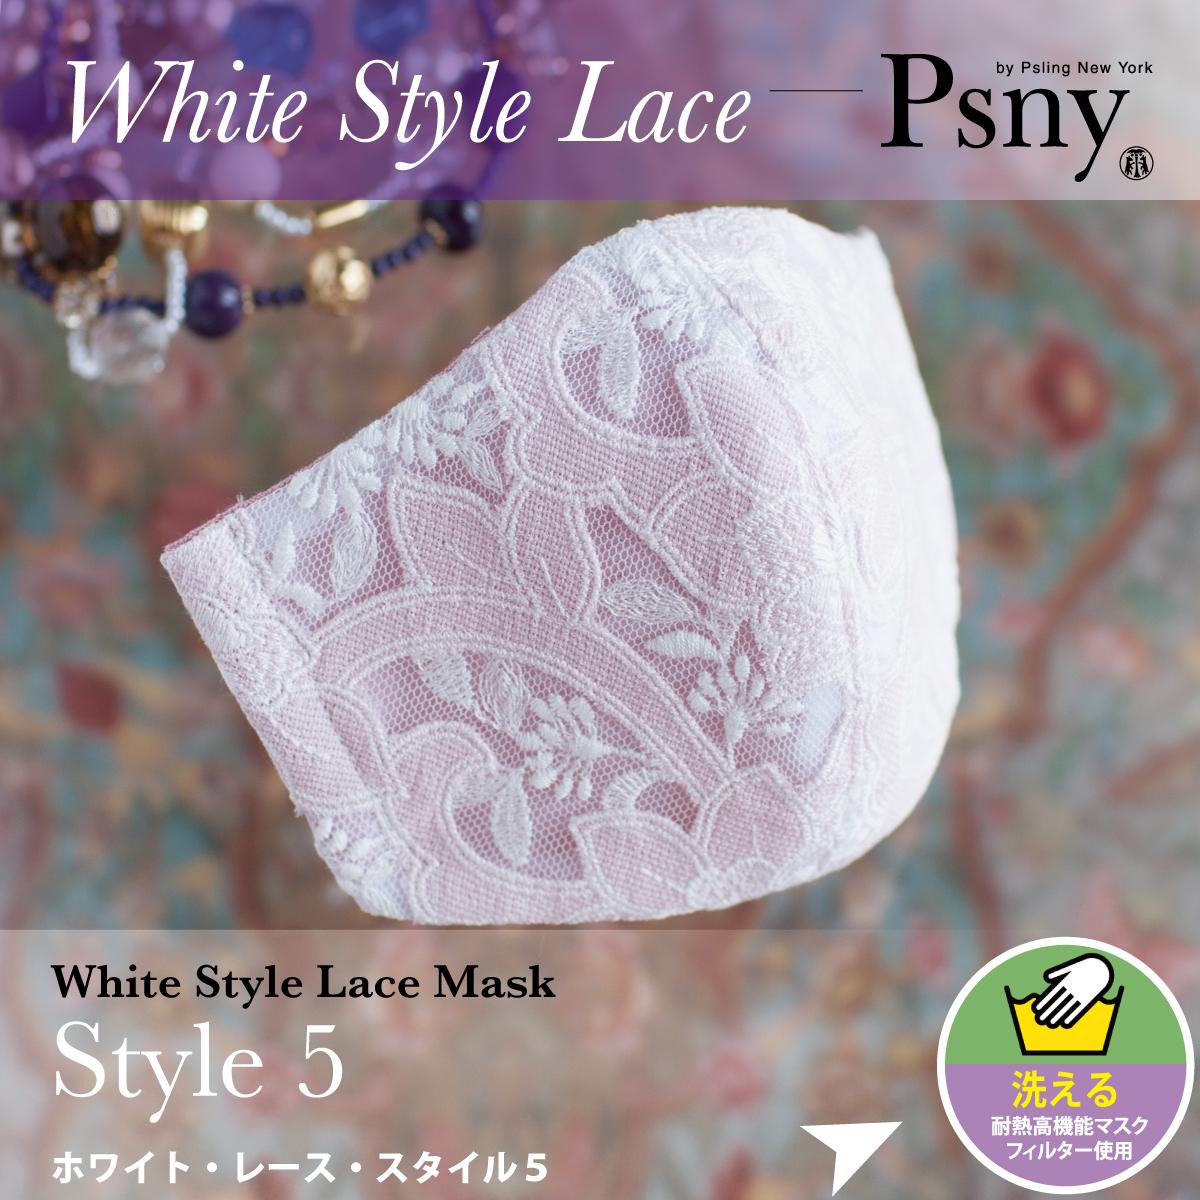 PSNY レース ホワイト・スタイル5 洗える不織布フィルター入り 立体 大人用 黄砂 花粉 美人 清潔 きれいめ マスク 送料無料 L25